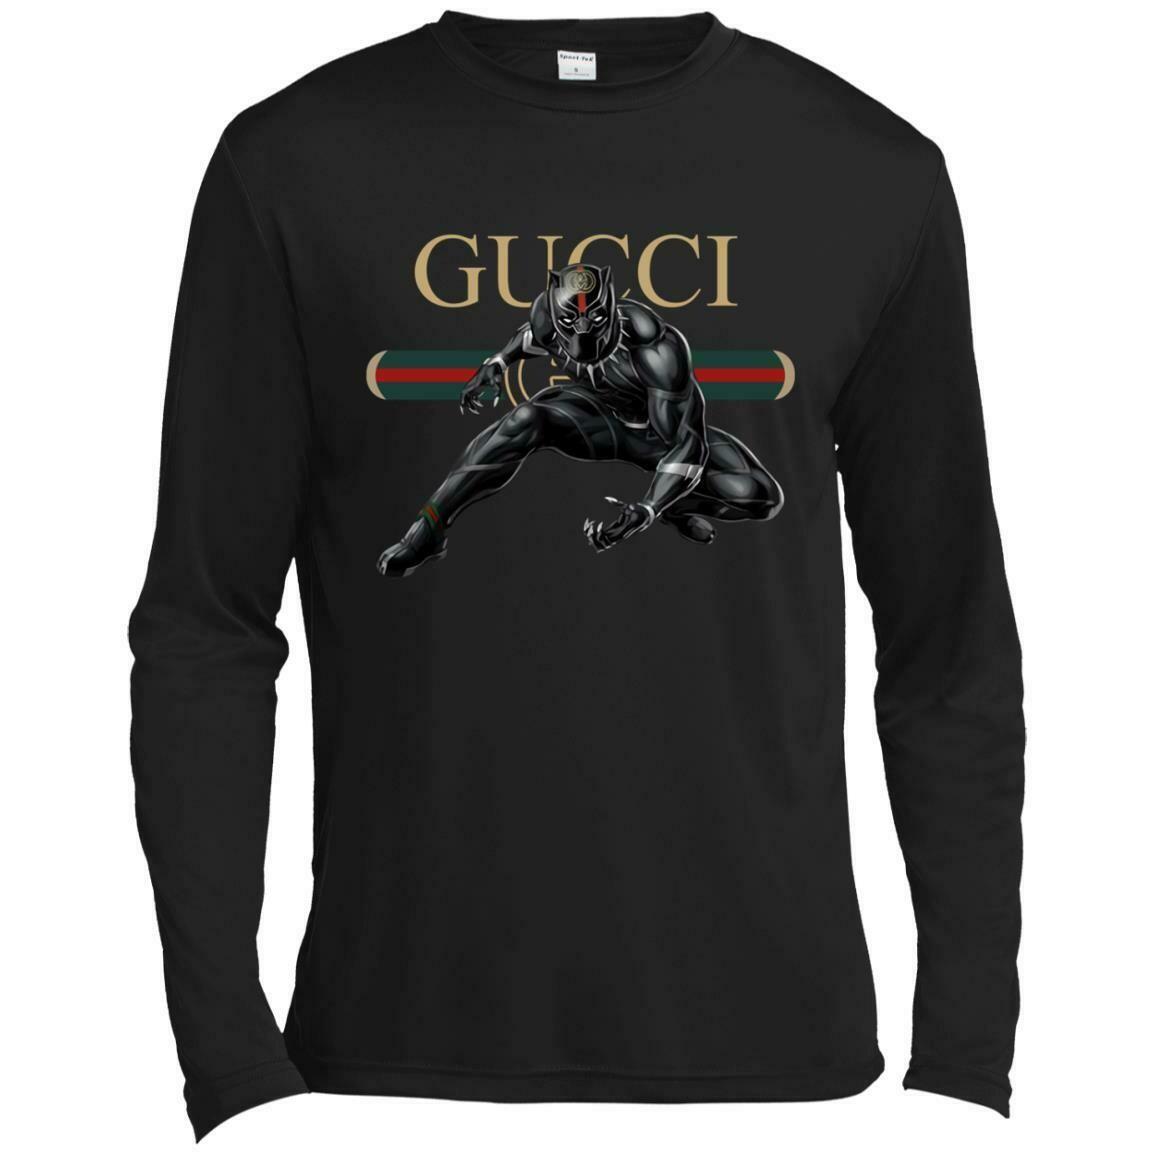 Cool Black Panther Gucci Premium Logo Gucci, Gucci Shirt, Gucci T-shirt, Gucci Logo, Gucci Fashion shirt, Fashion shirt, Gucci Design shirt,Snake Gucci vintage shirt